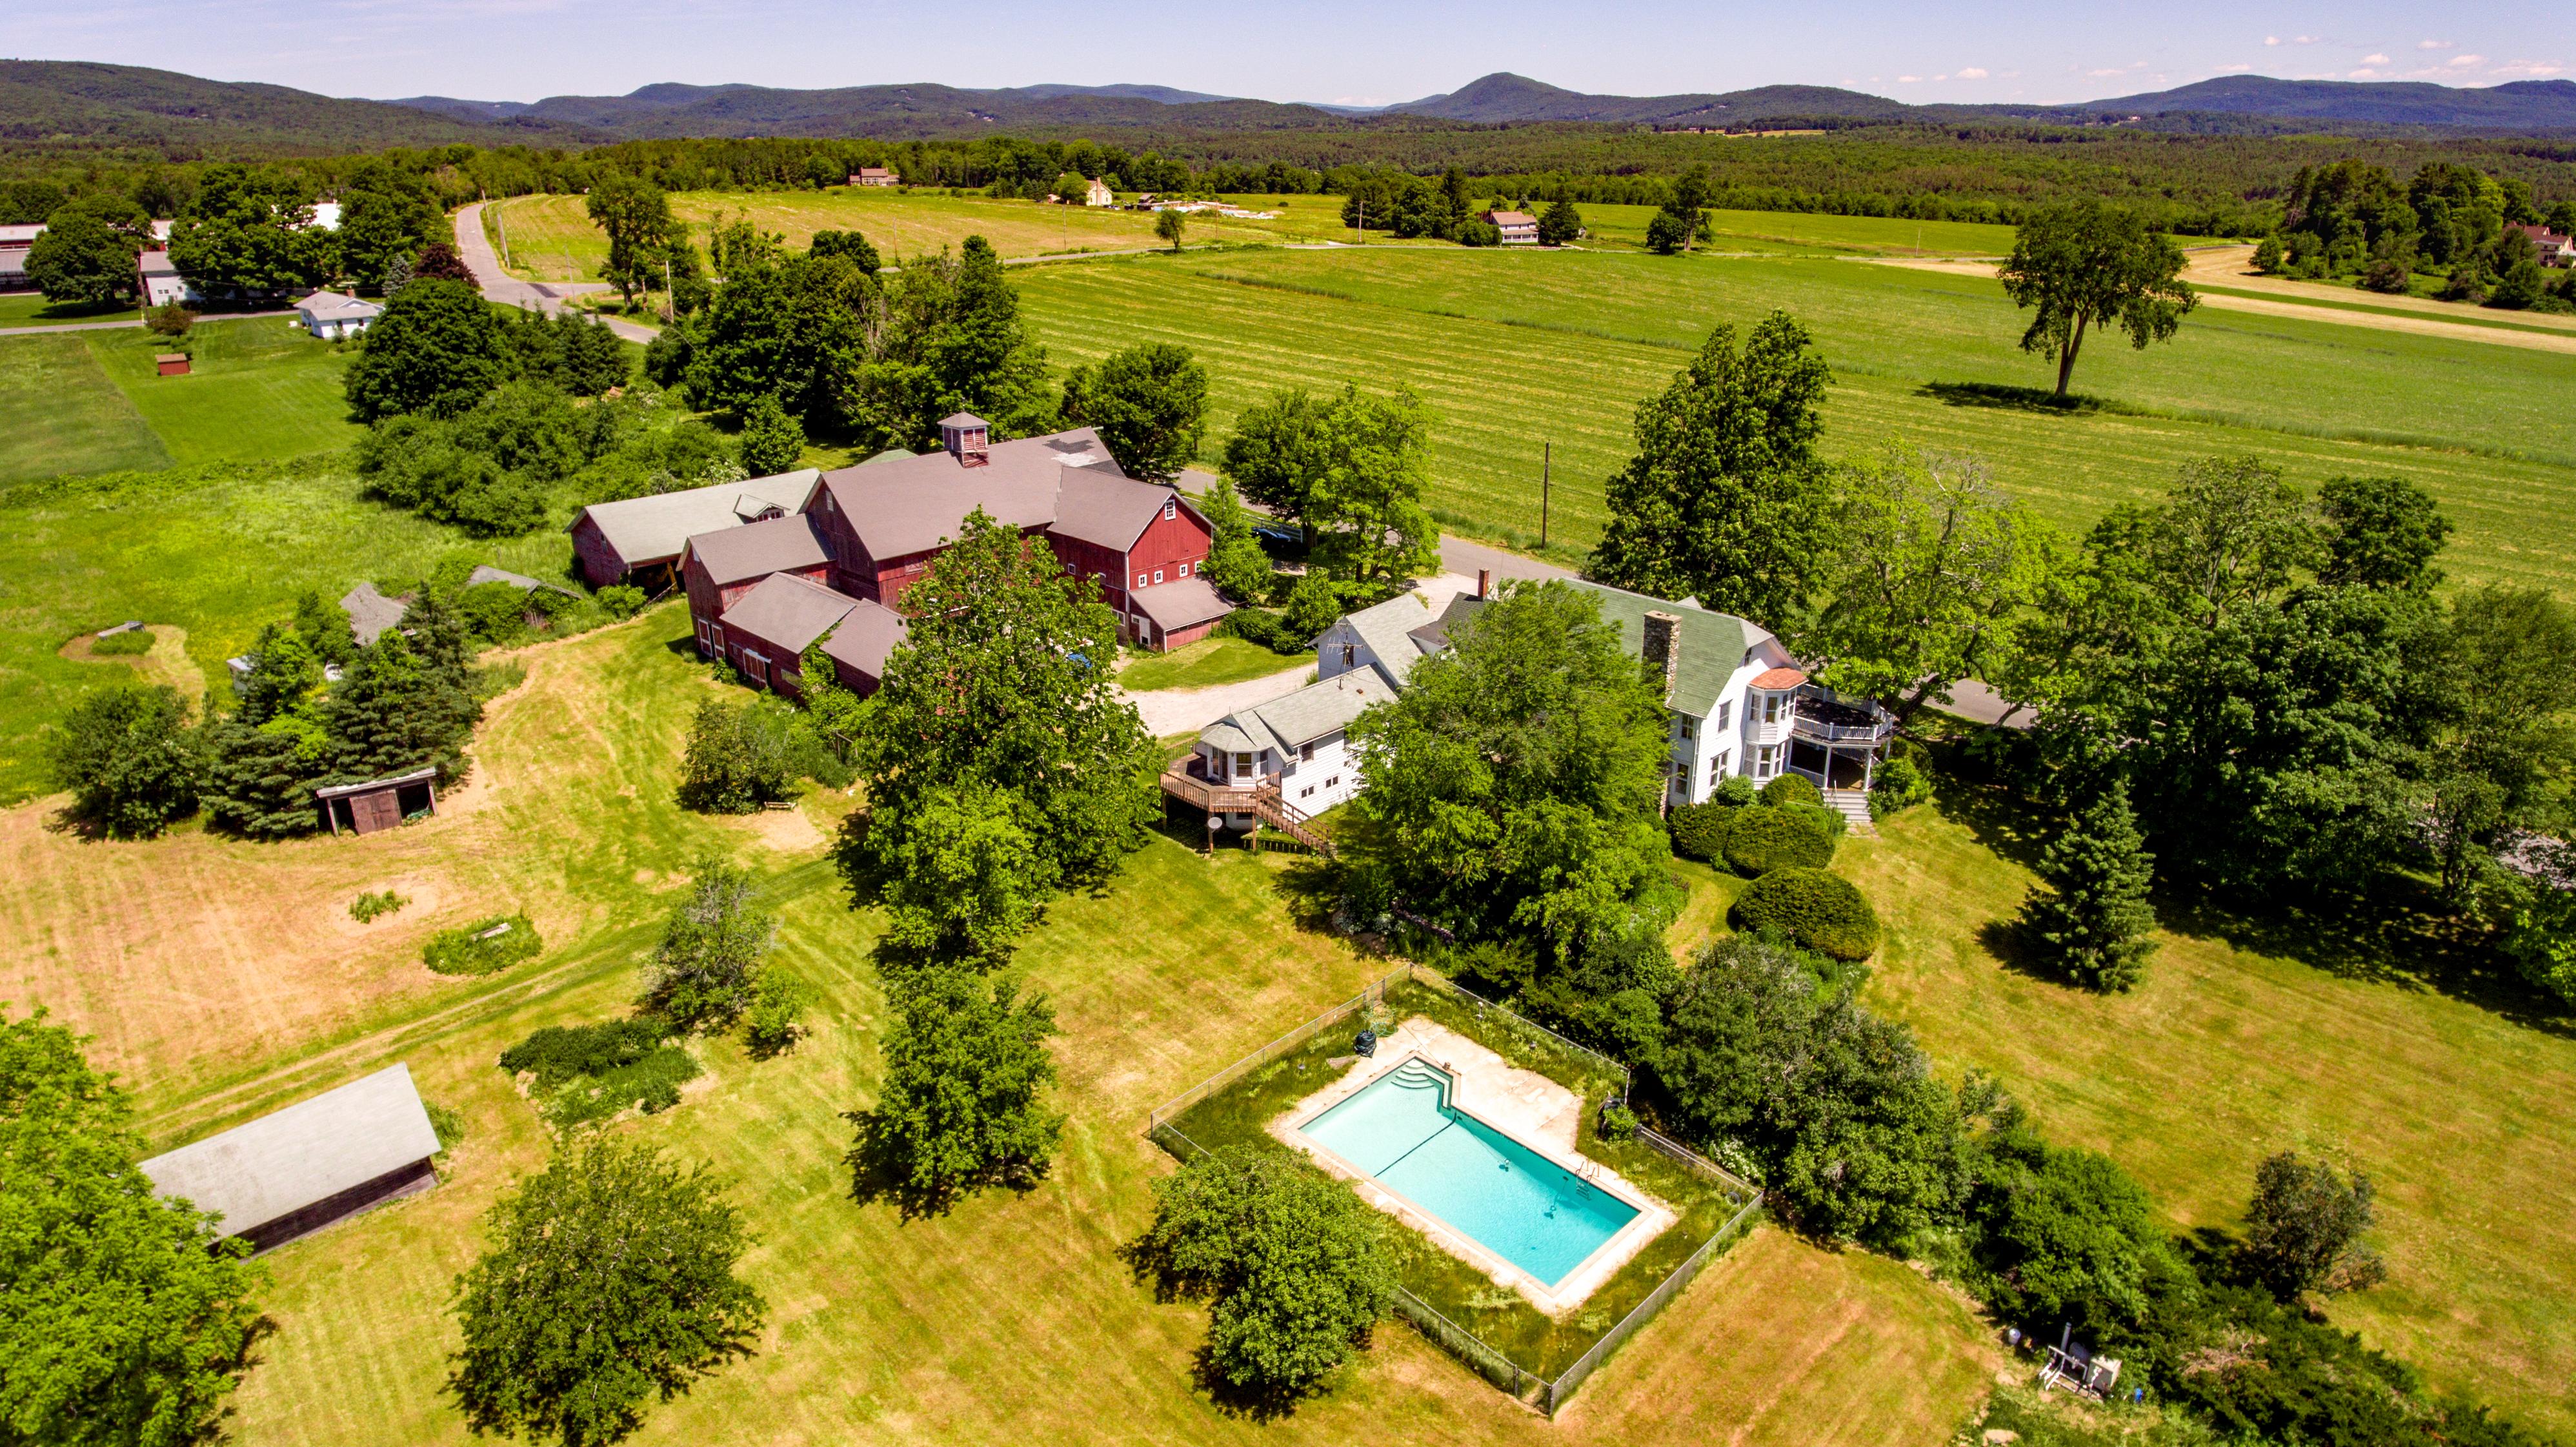 獨棟家庭住宅 為 出售 在 Baldwin Hill Farm - an Iconic Berkshire Property 121 Baldwin Hill Rd Egremont, 麻塞諸塞州, 01258 美國